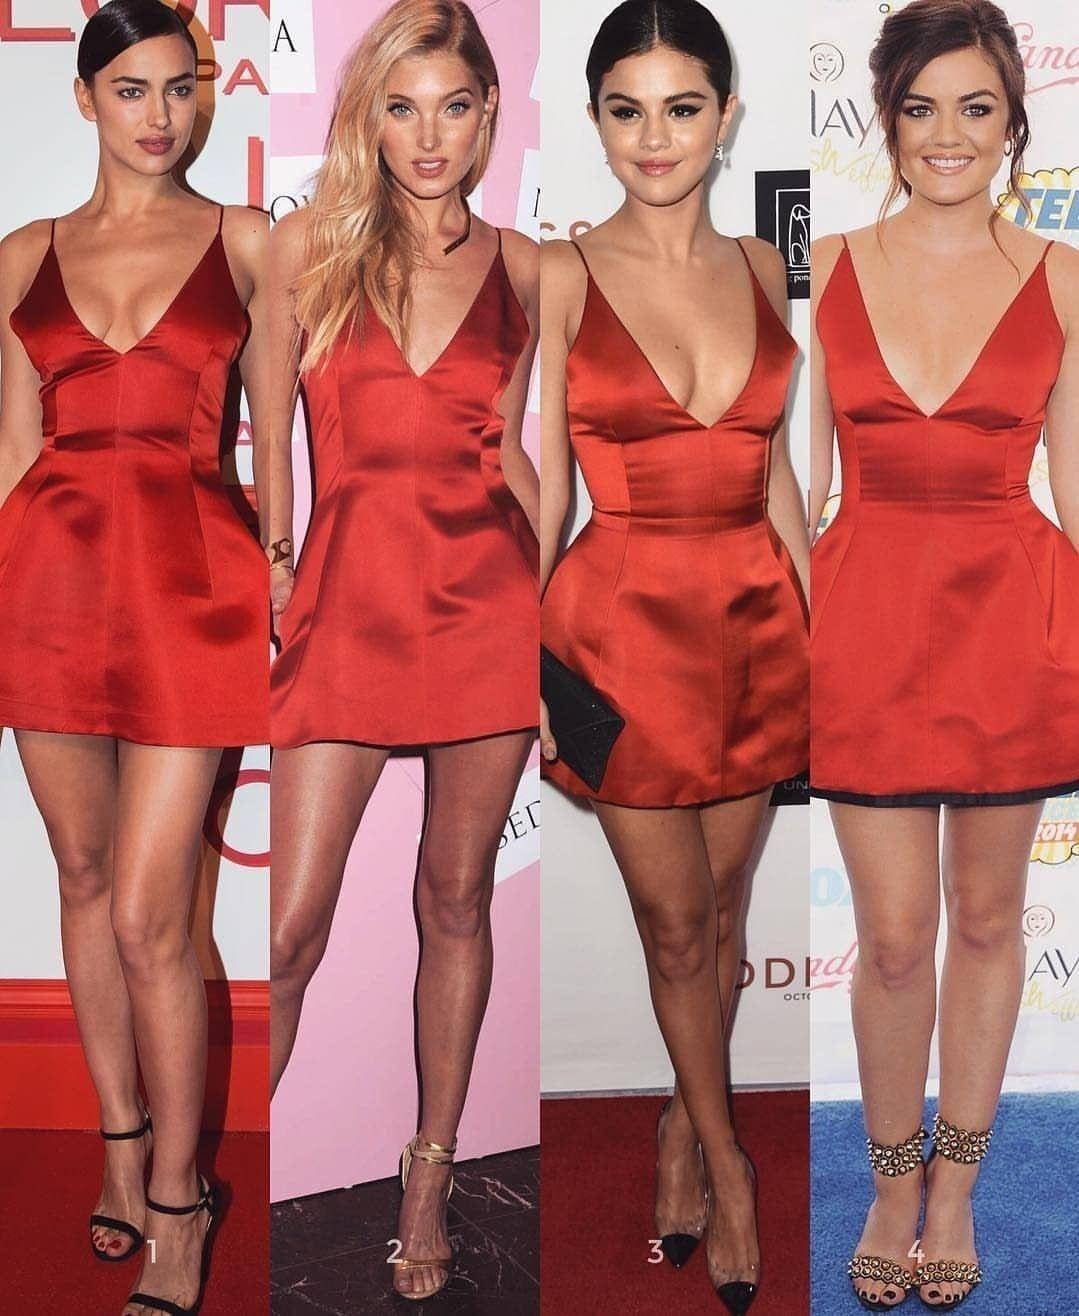 aad304d3c9c red  Dior mini dress ❤ Who wore it best  1-4      IrinaShayk  ElsaHosk   SelenaGomez  LucyHale via  fashionovely  redDress PartyDress